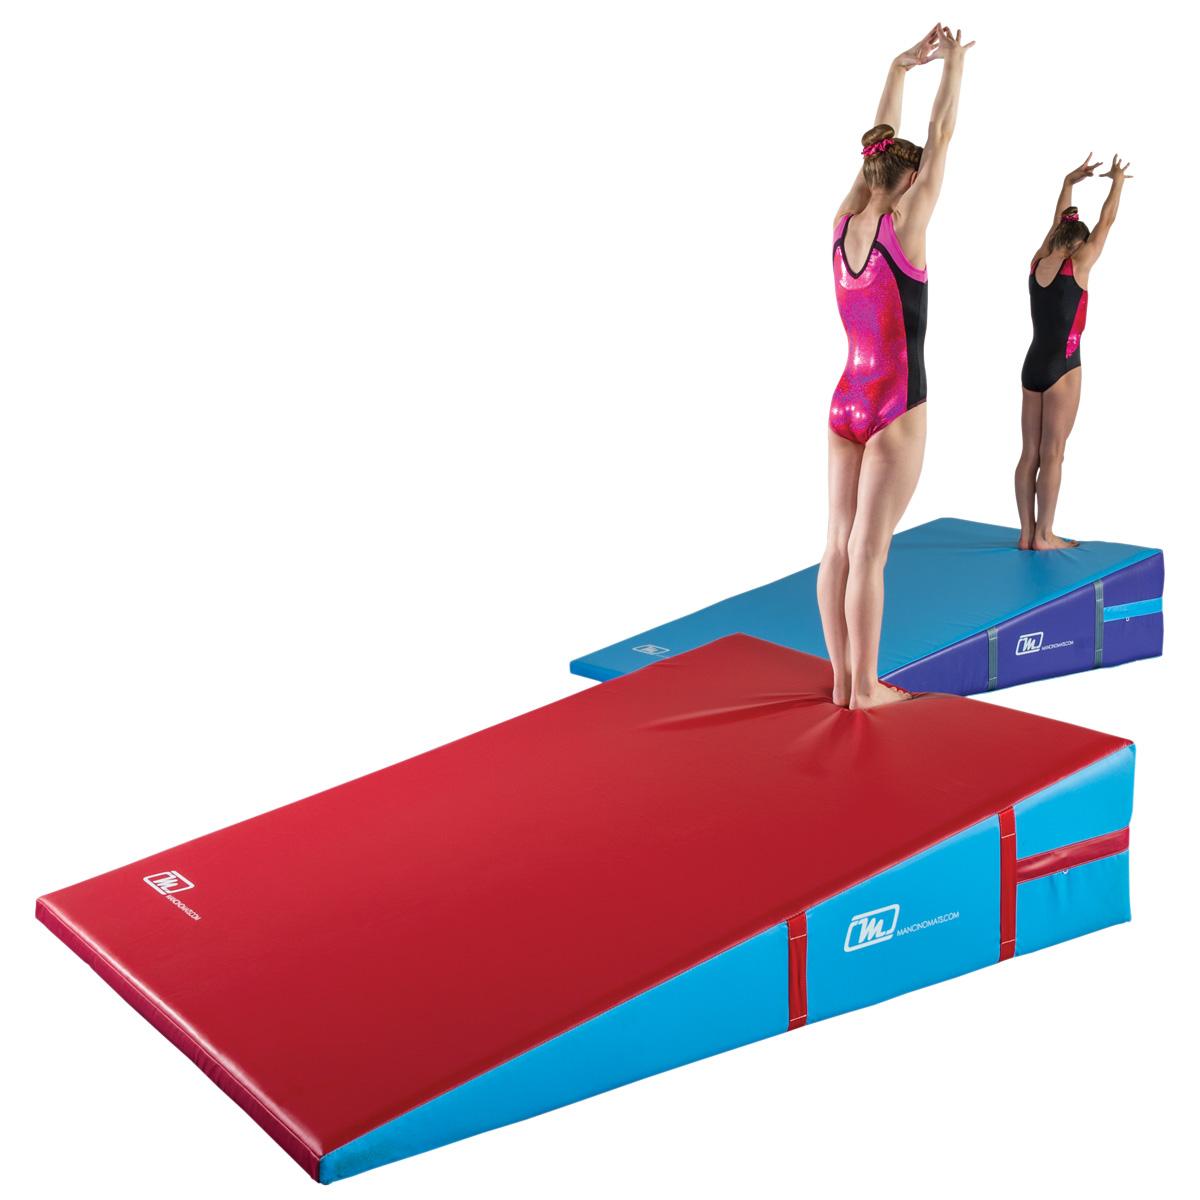 firm top ramp mats incline wedge cheese gymnastics - Mancino Mats